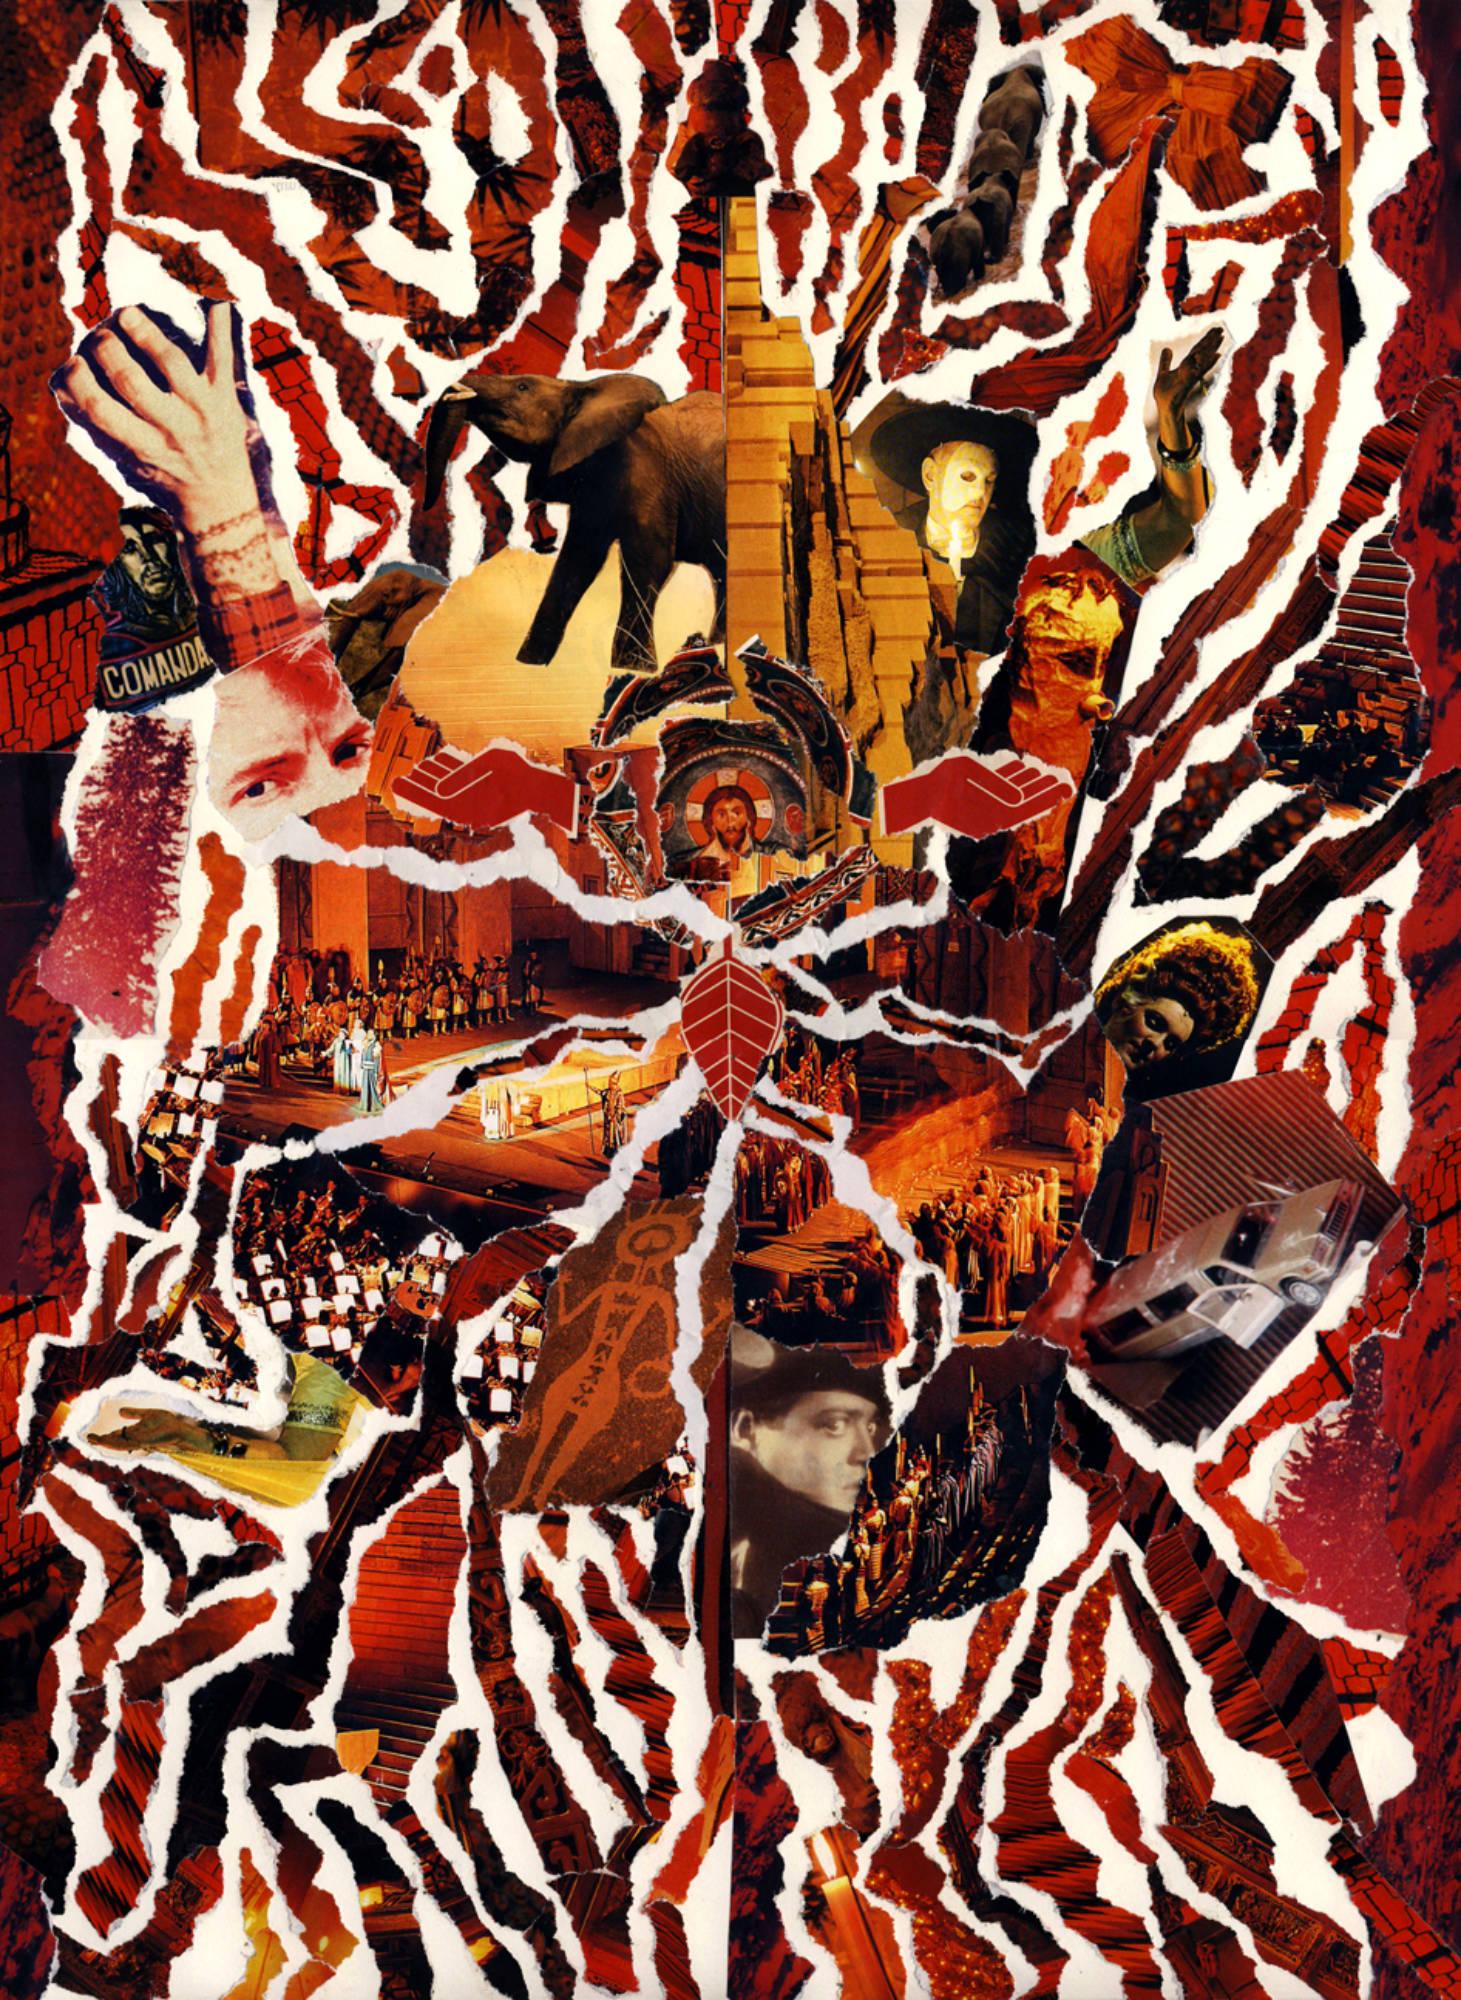 saints and sinners, Marc Allgaier, 2011